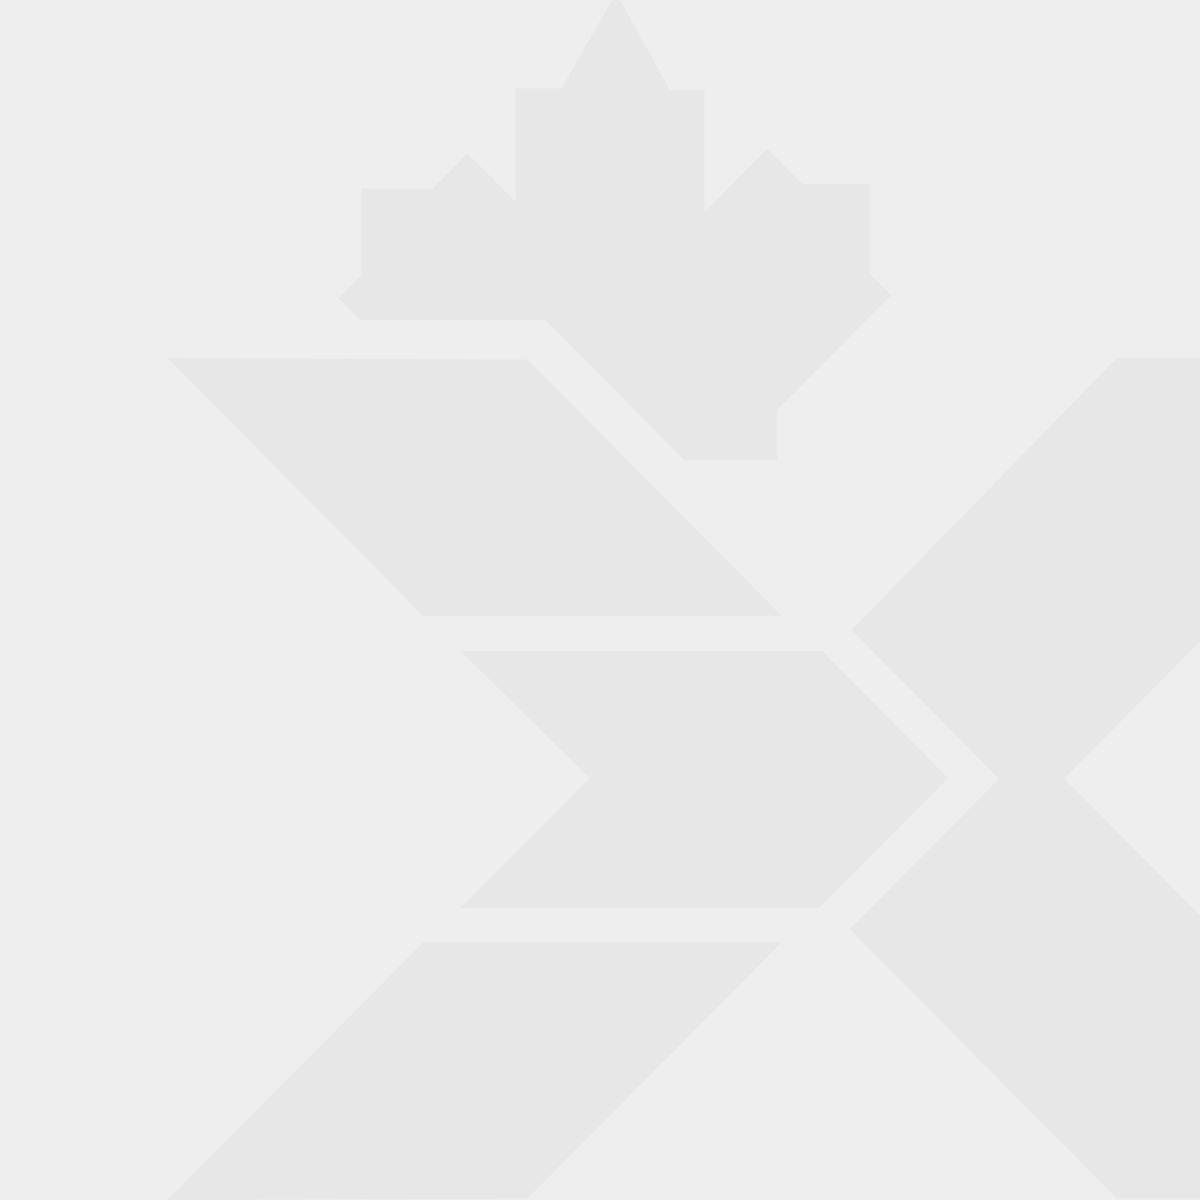 Canadian Army Men U0026 39 S Short Sleeve T